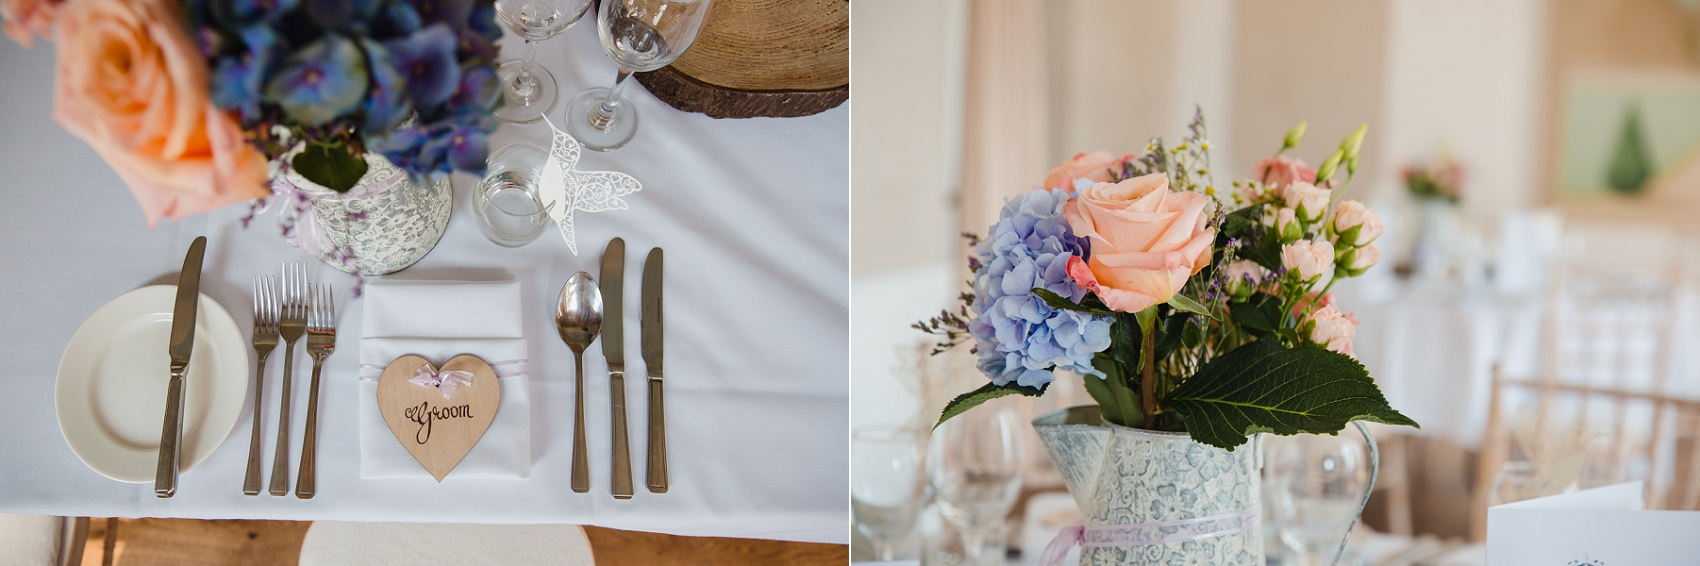 Spring wedding decor Norwood Park